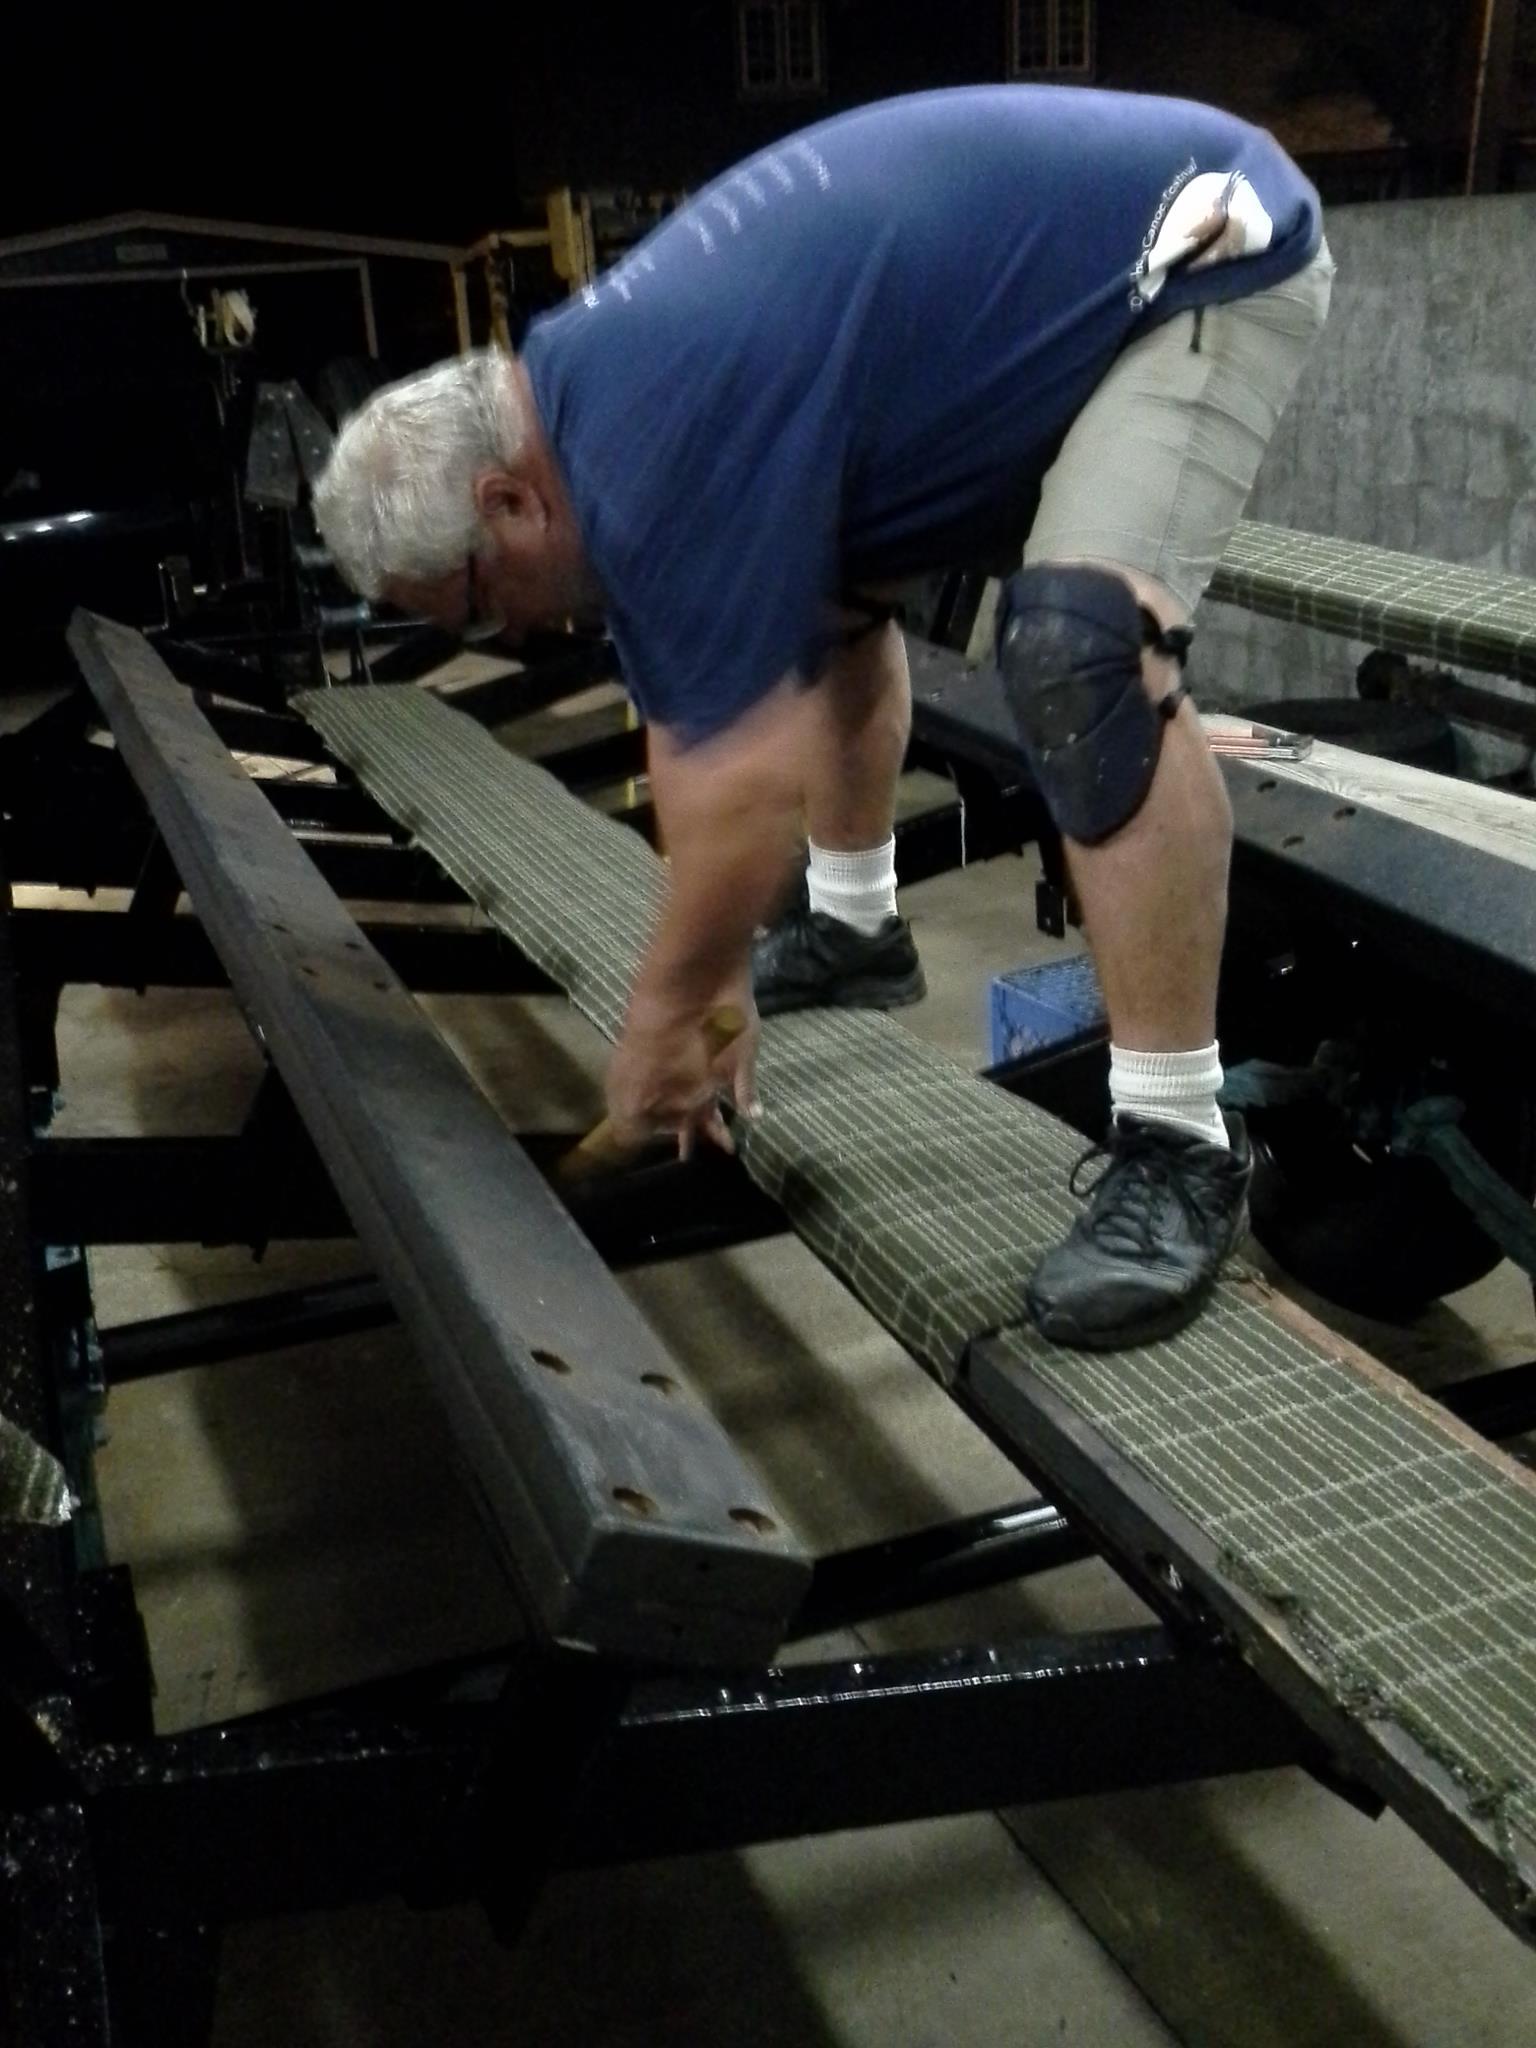 Trailer Planks & Carpeting